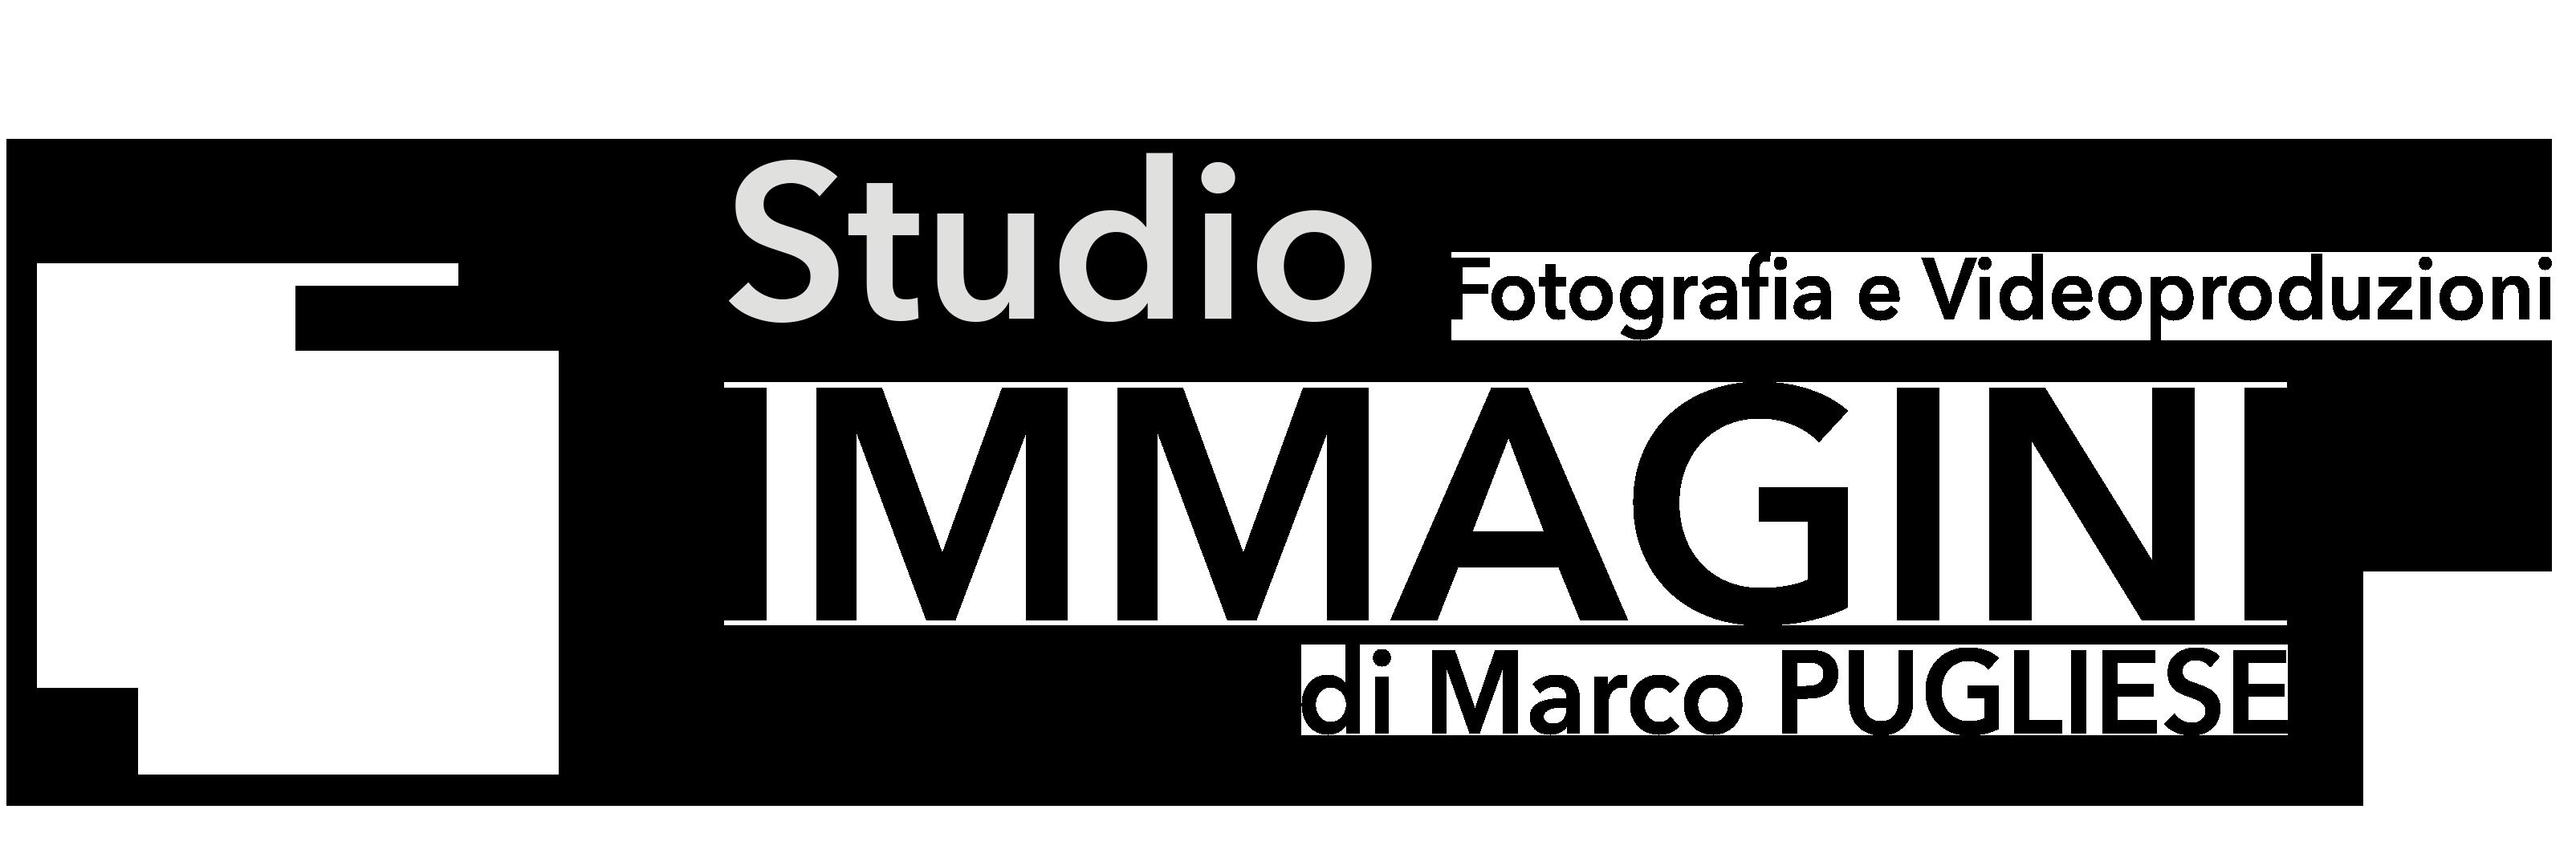 immagini di marco pugliese studio foto e video